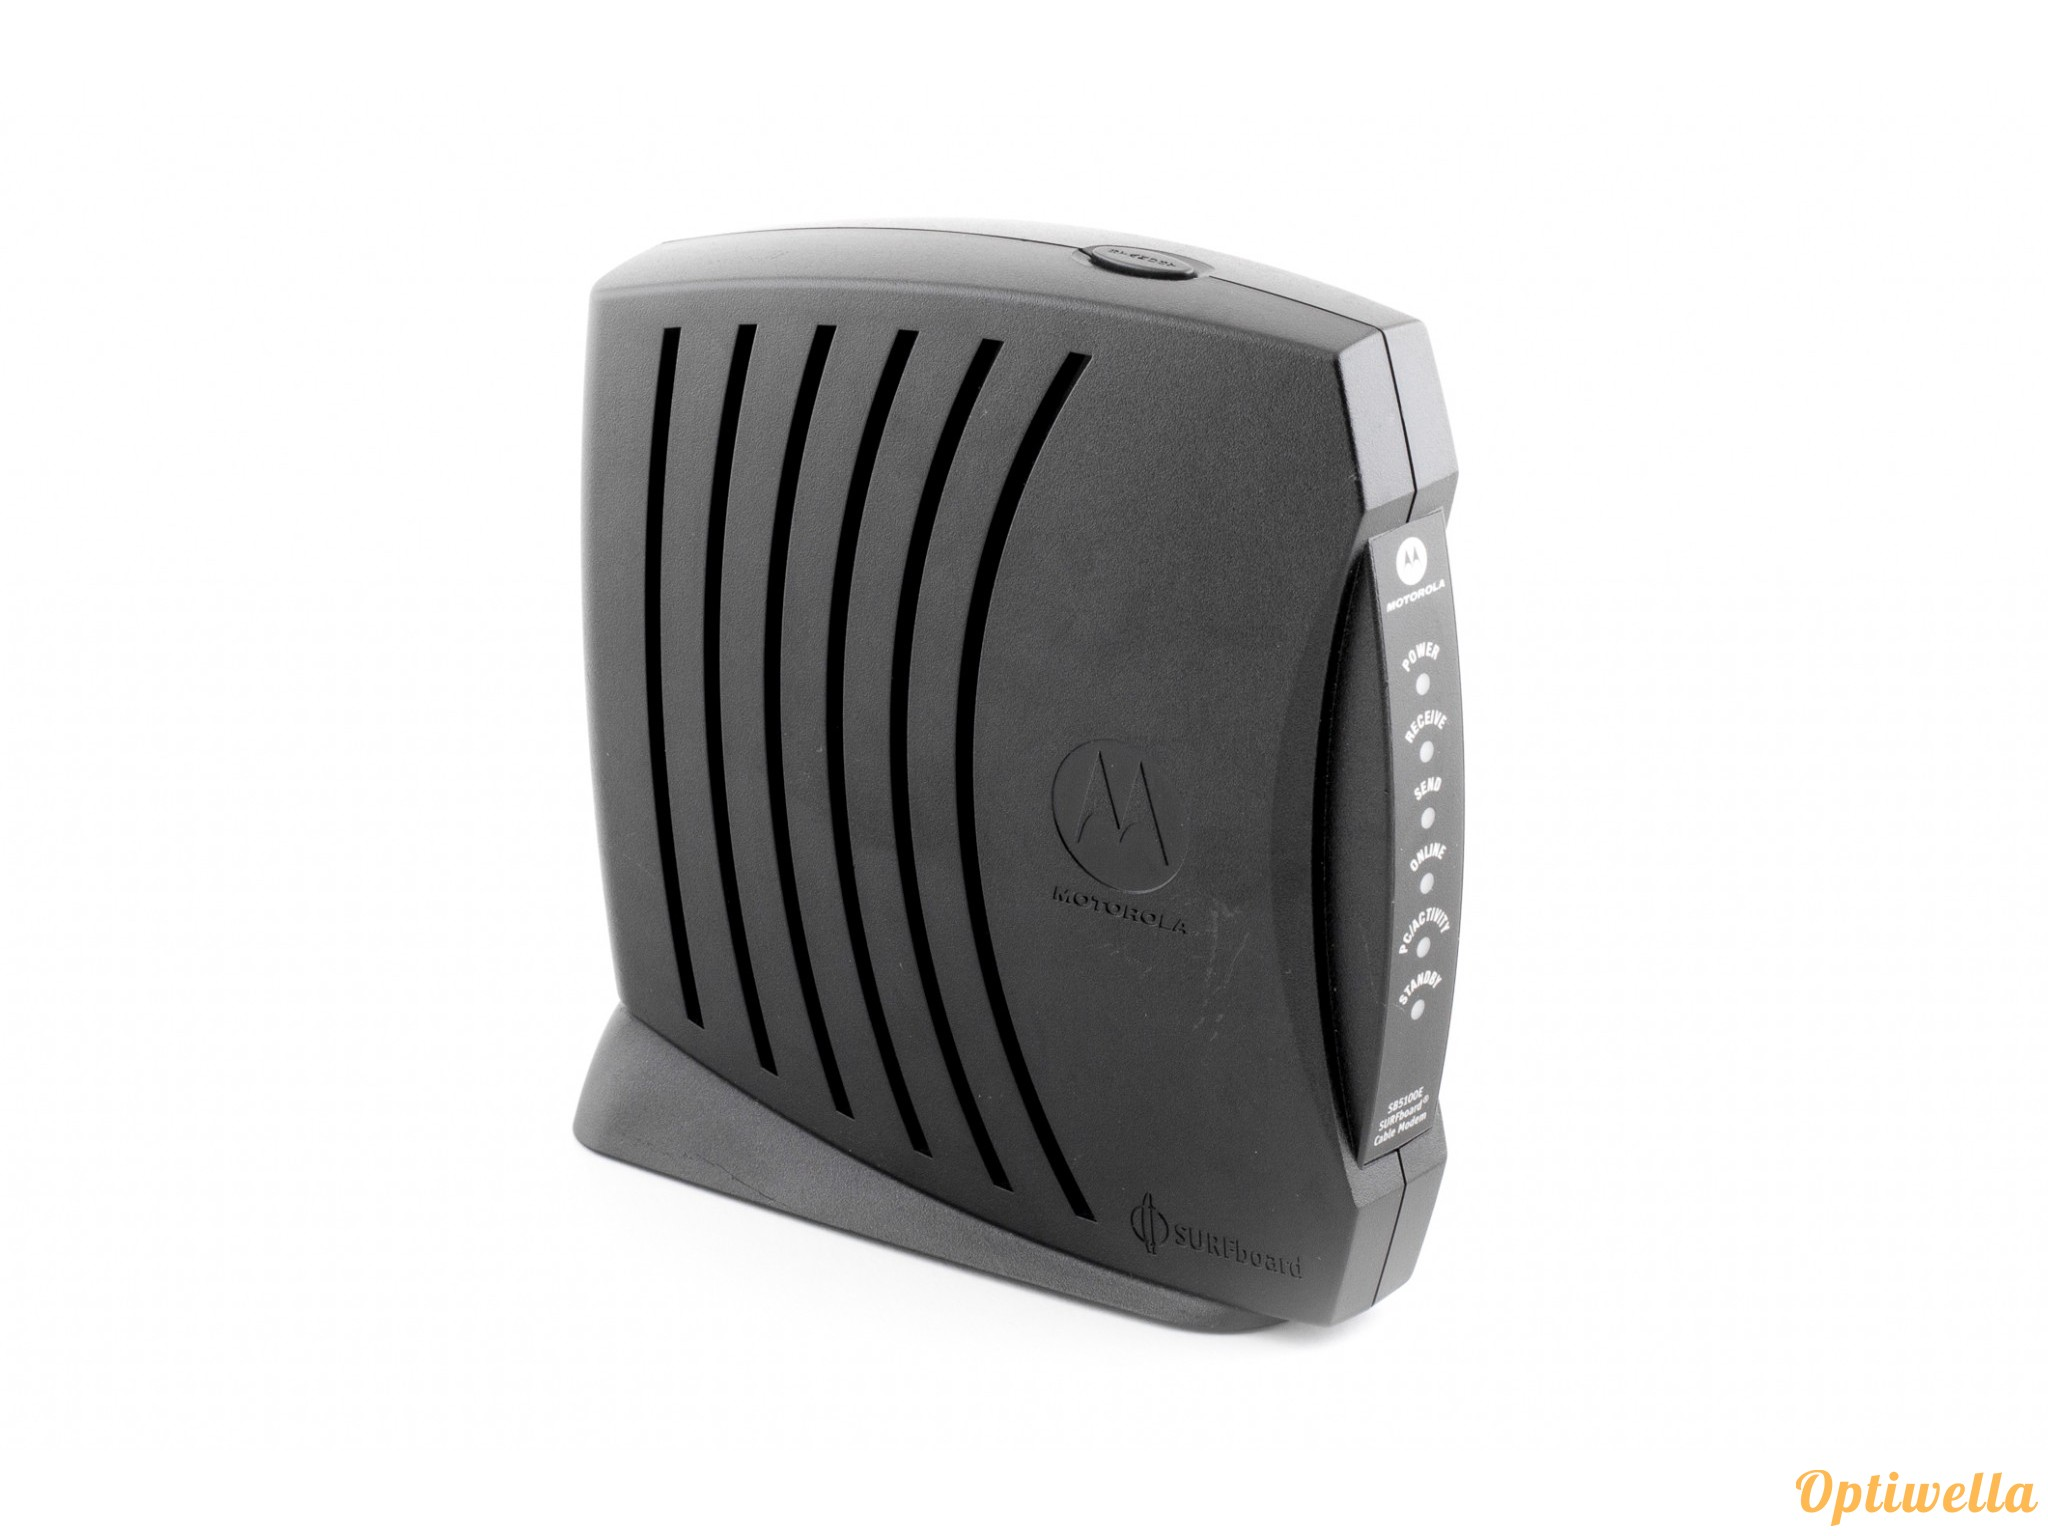 Motorola surfboard sb5100 cable modem modem motorola surfboard sb5100 cable modem sciox Images